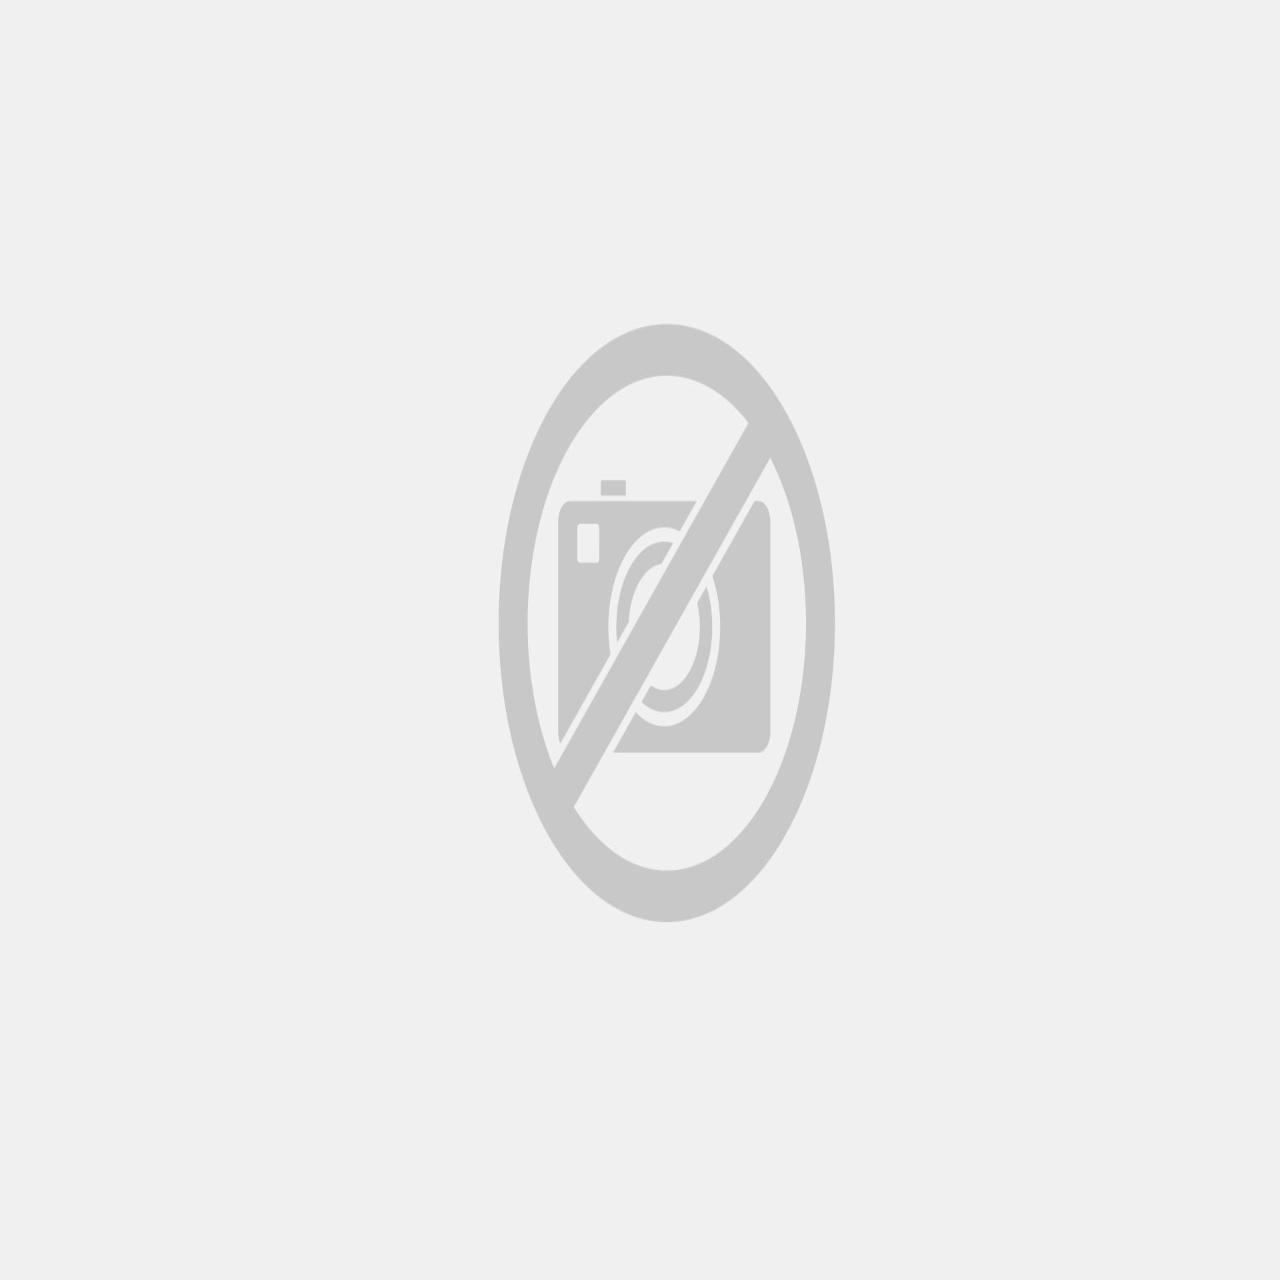 Hotel Novotel Jakarta Gajah Mada 4 Hrs Star Hotel In Jakarta